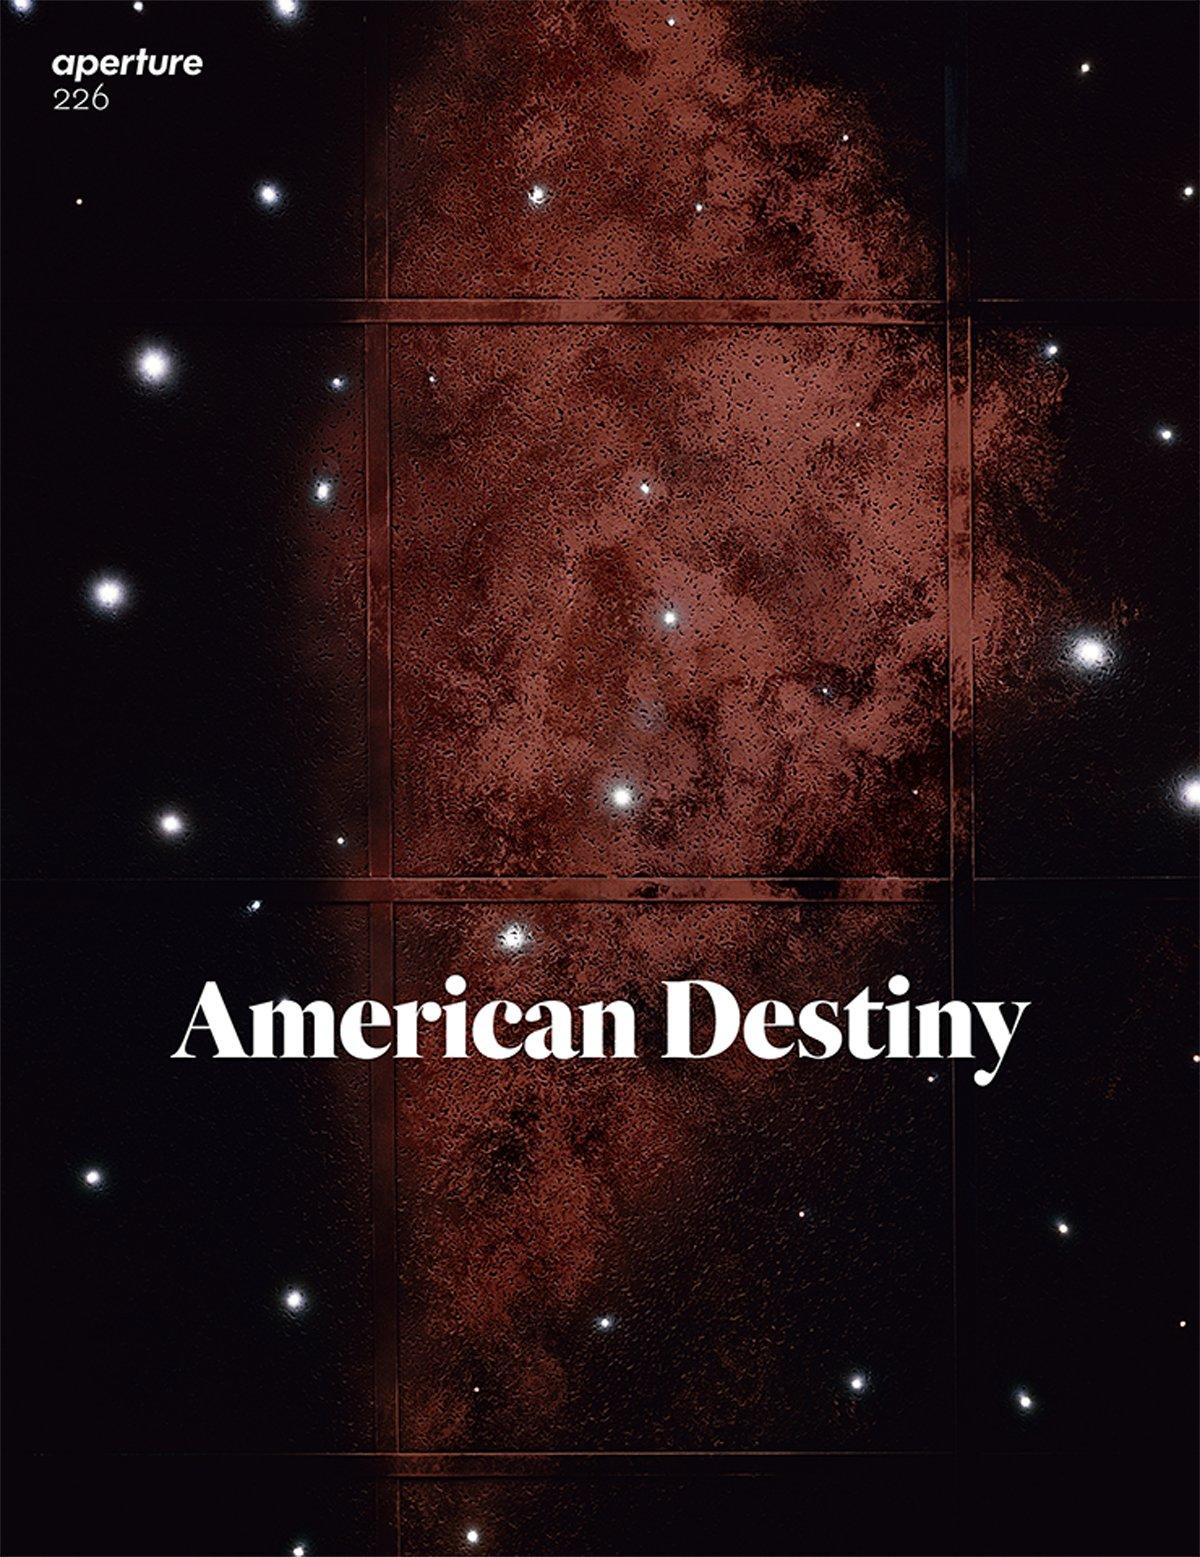 American Destiny: Aperture 226